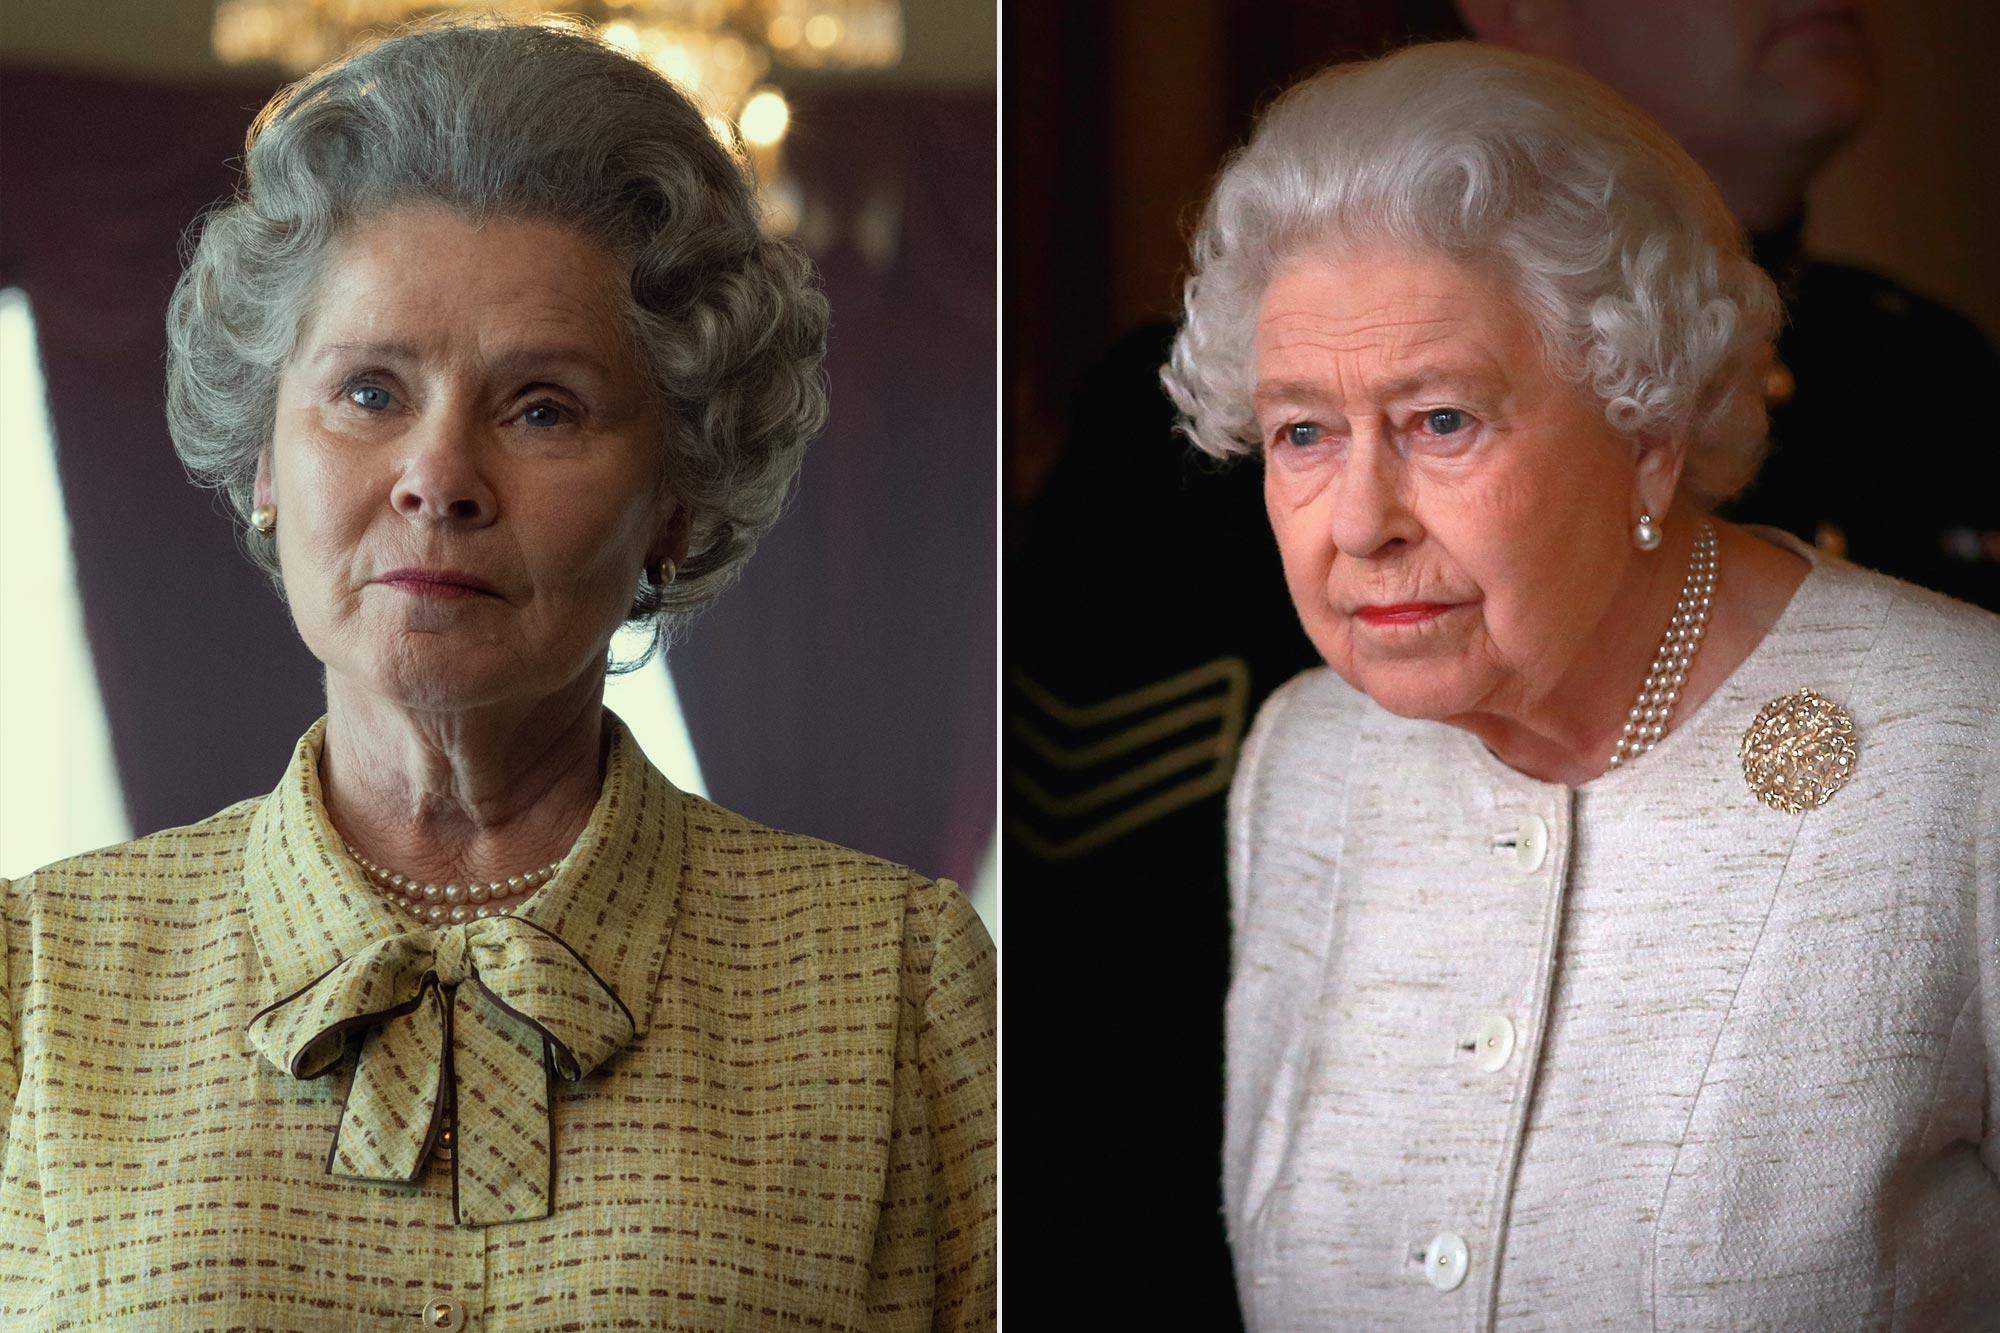 The Crown, Imelda Staunton; Queen Elizabeth II